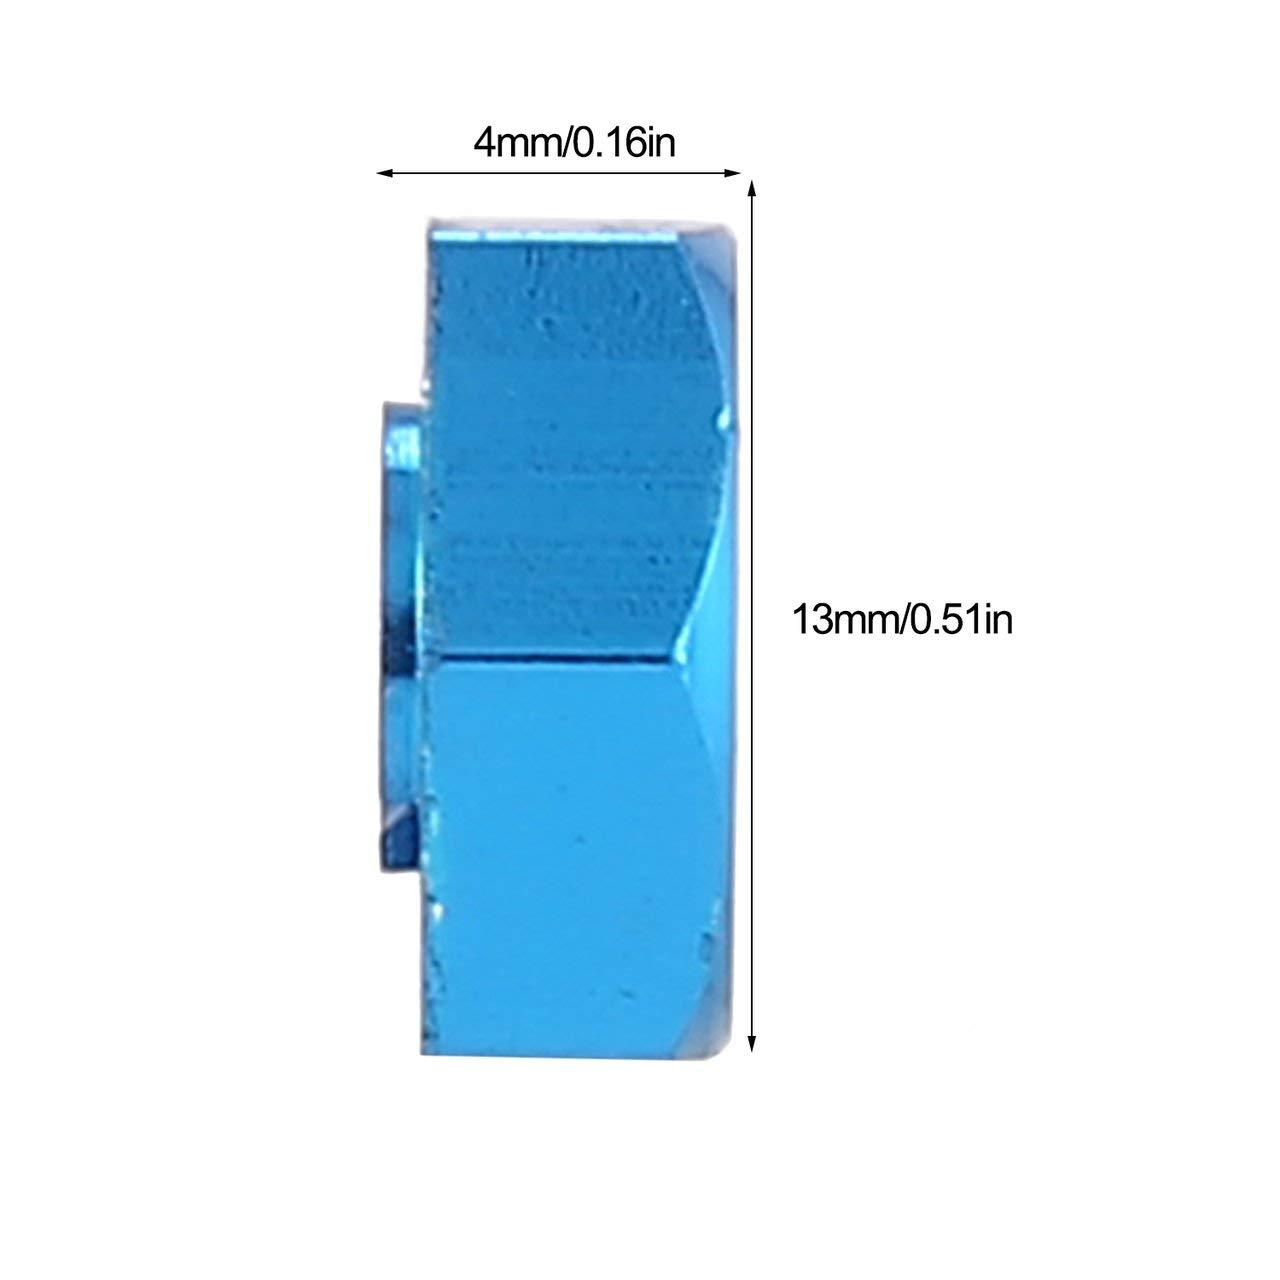 Demino 10 Kit 2 Pin Way Impermeabile Legare Elettrico connettore Spina Set Automobile Connection